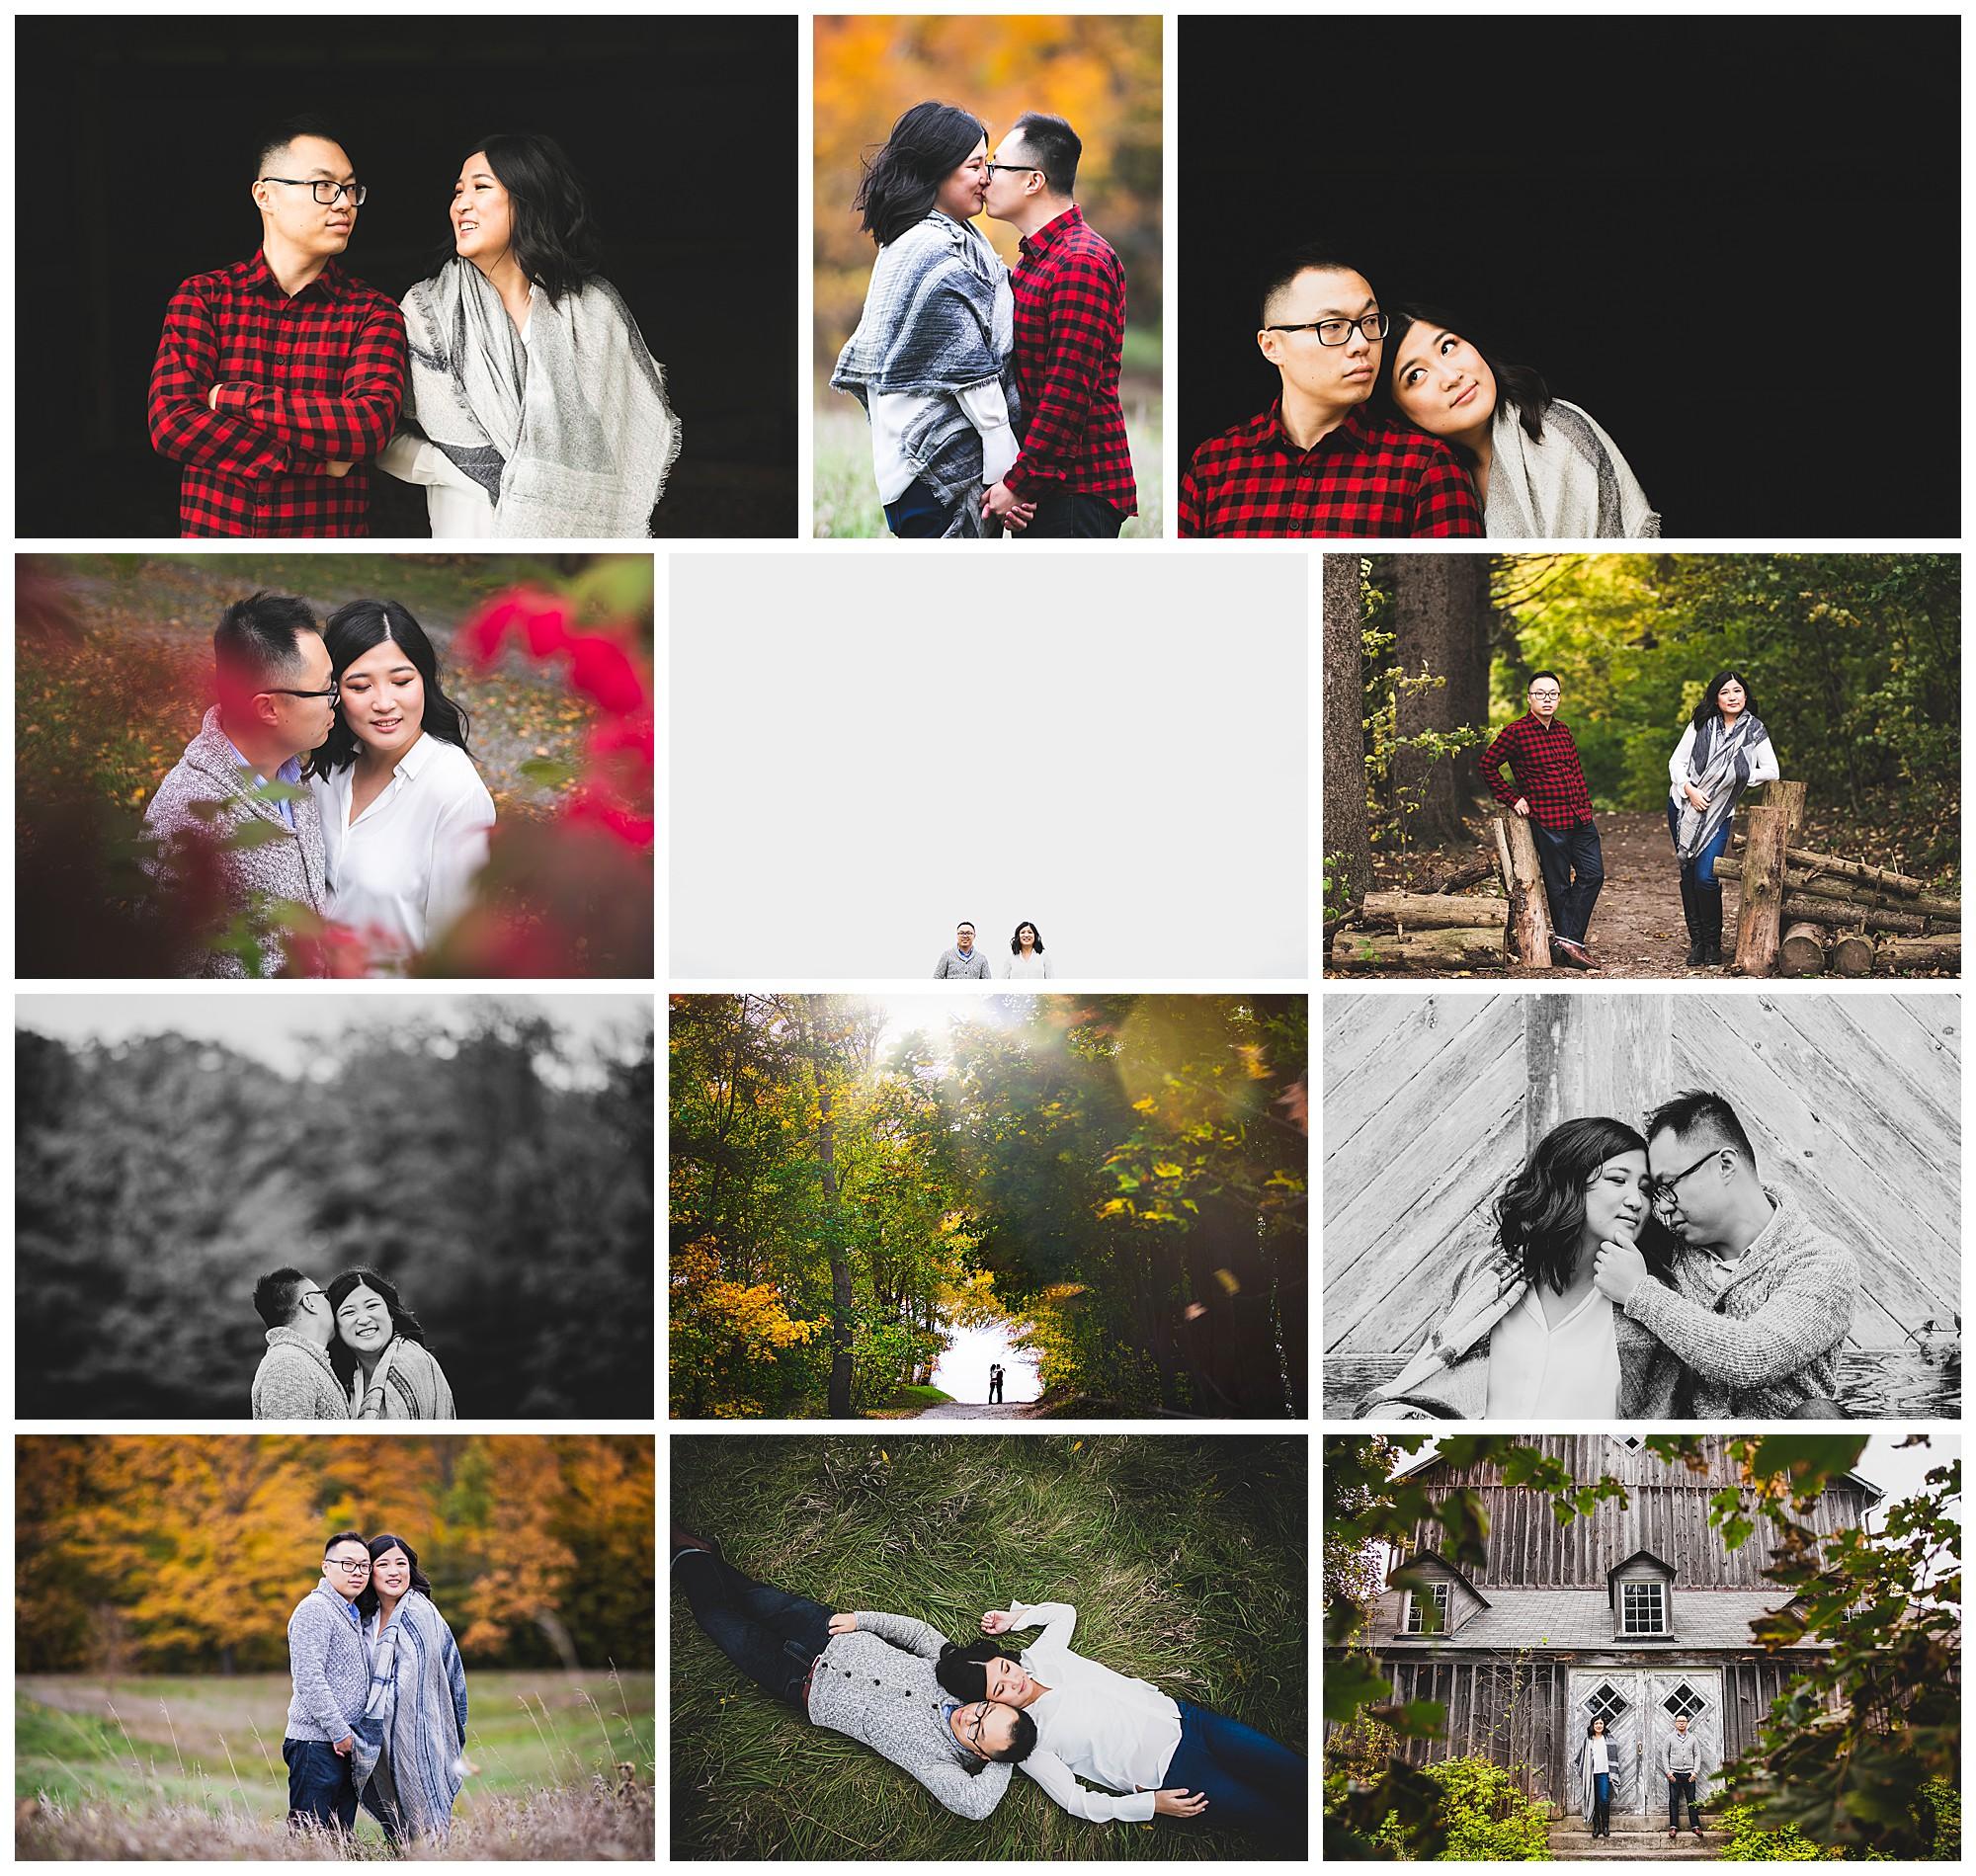 Scotsdale Farm, Halton Hills, Ontario engagement photos by VanDaele & Russell